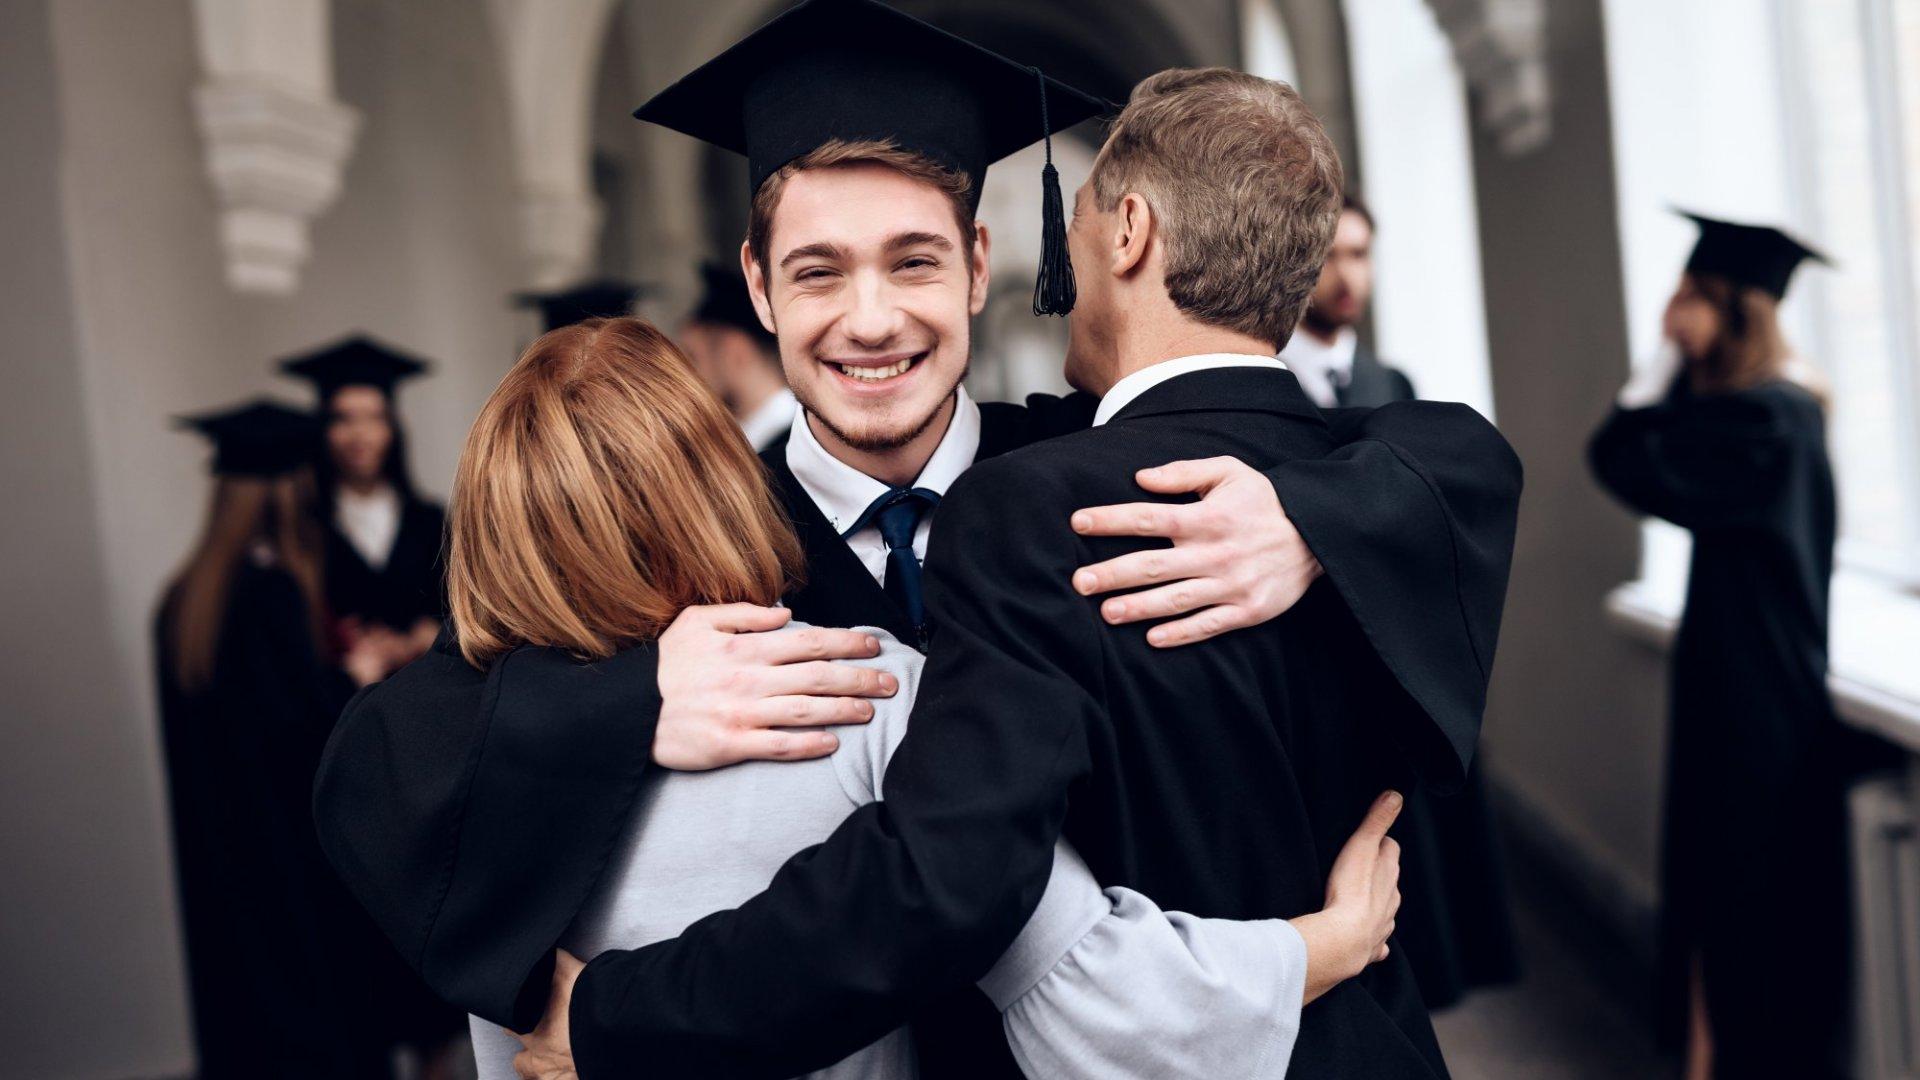 3 WaysParents Can Help Their Kids Avoid a Post-Graduation Career Meltdown